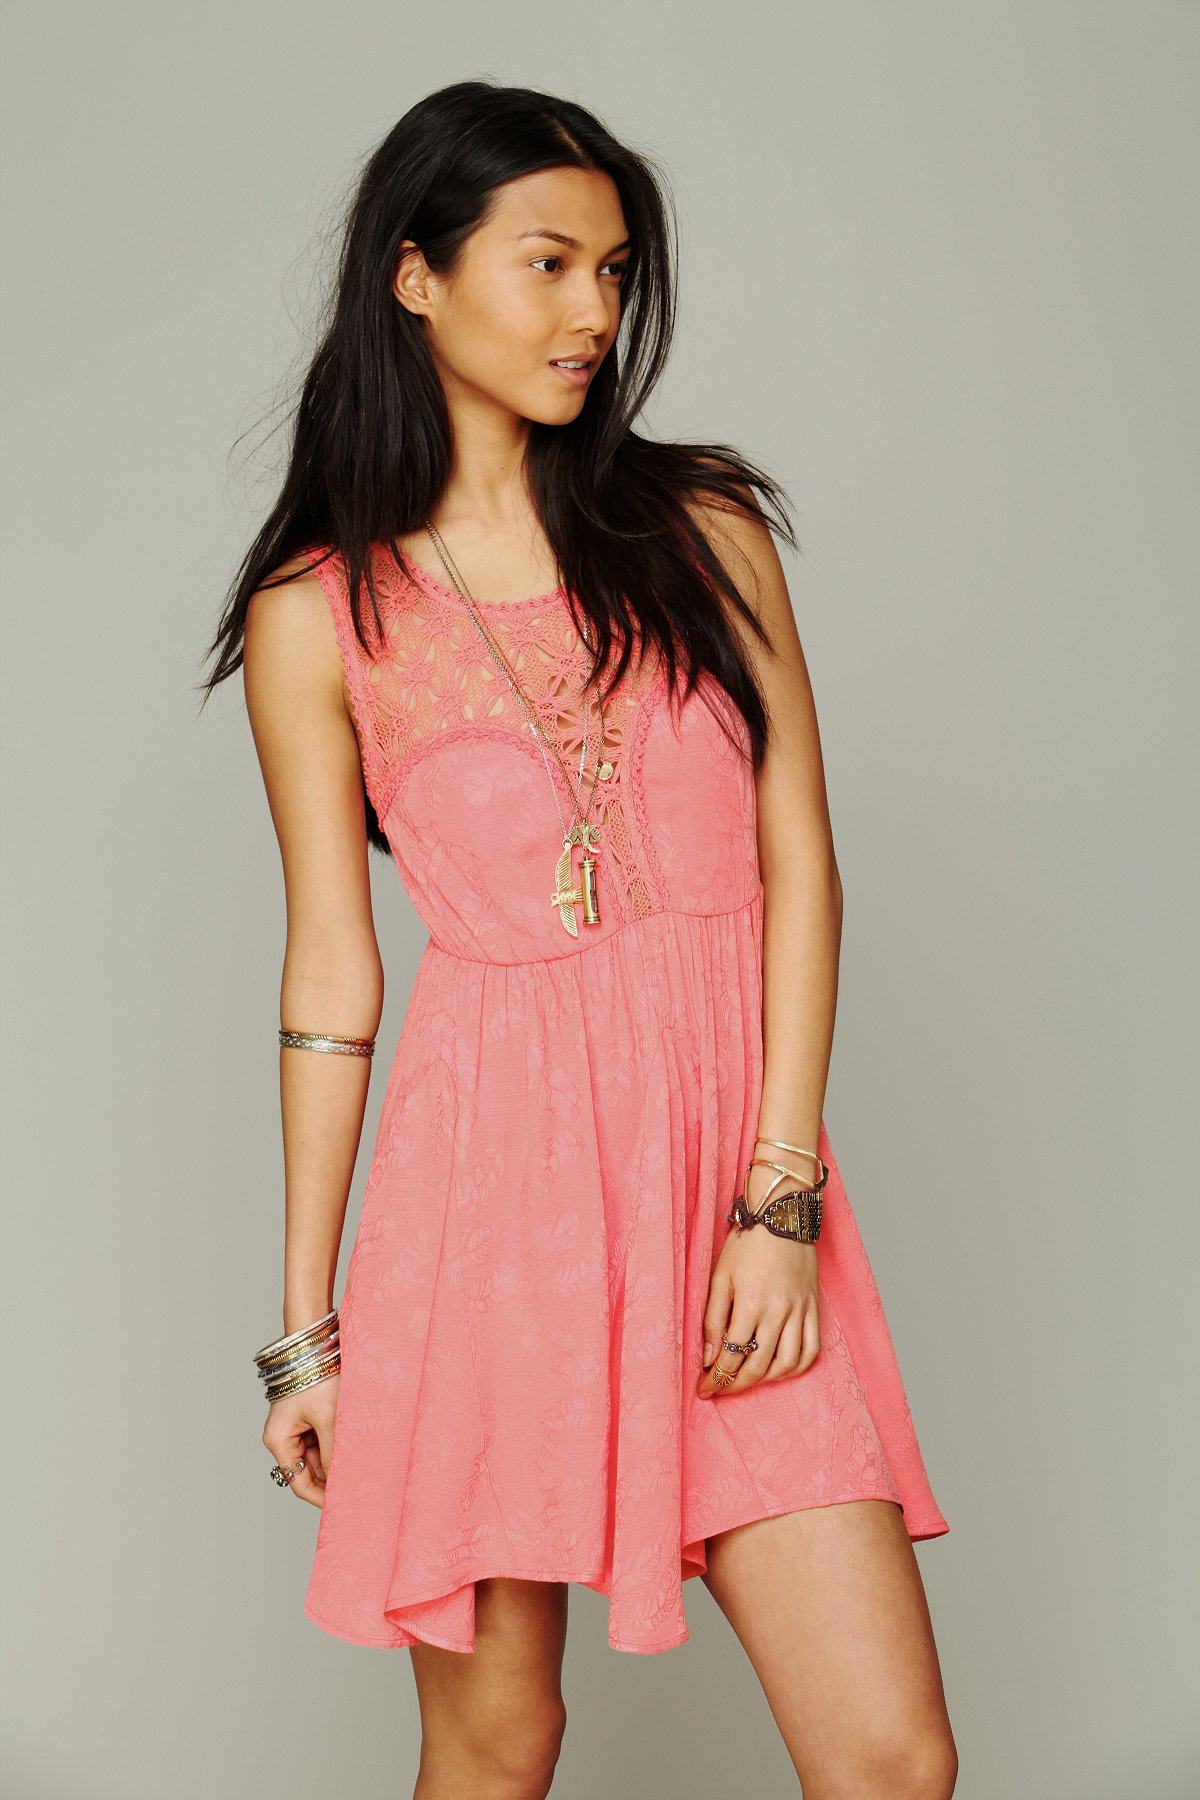 Lolita Syndrome Dress